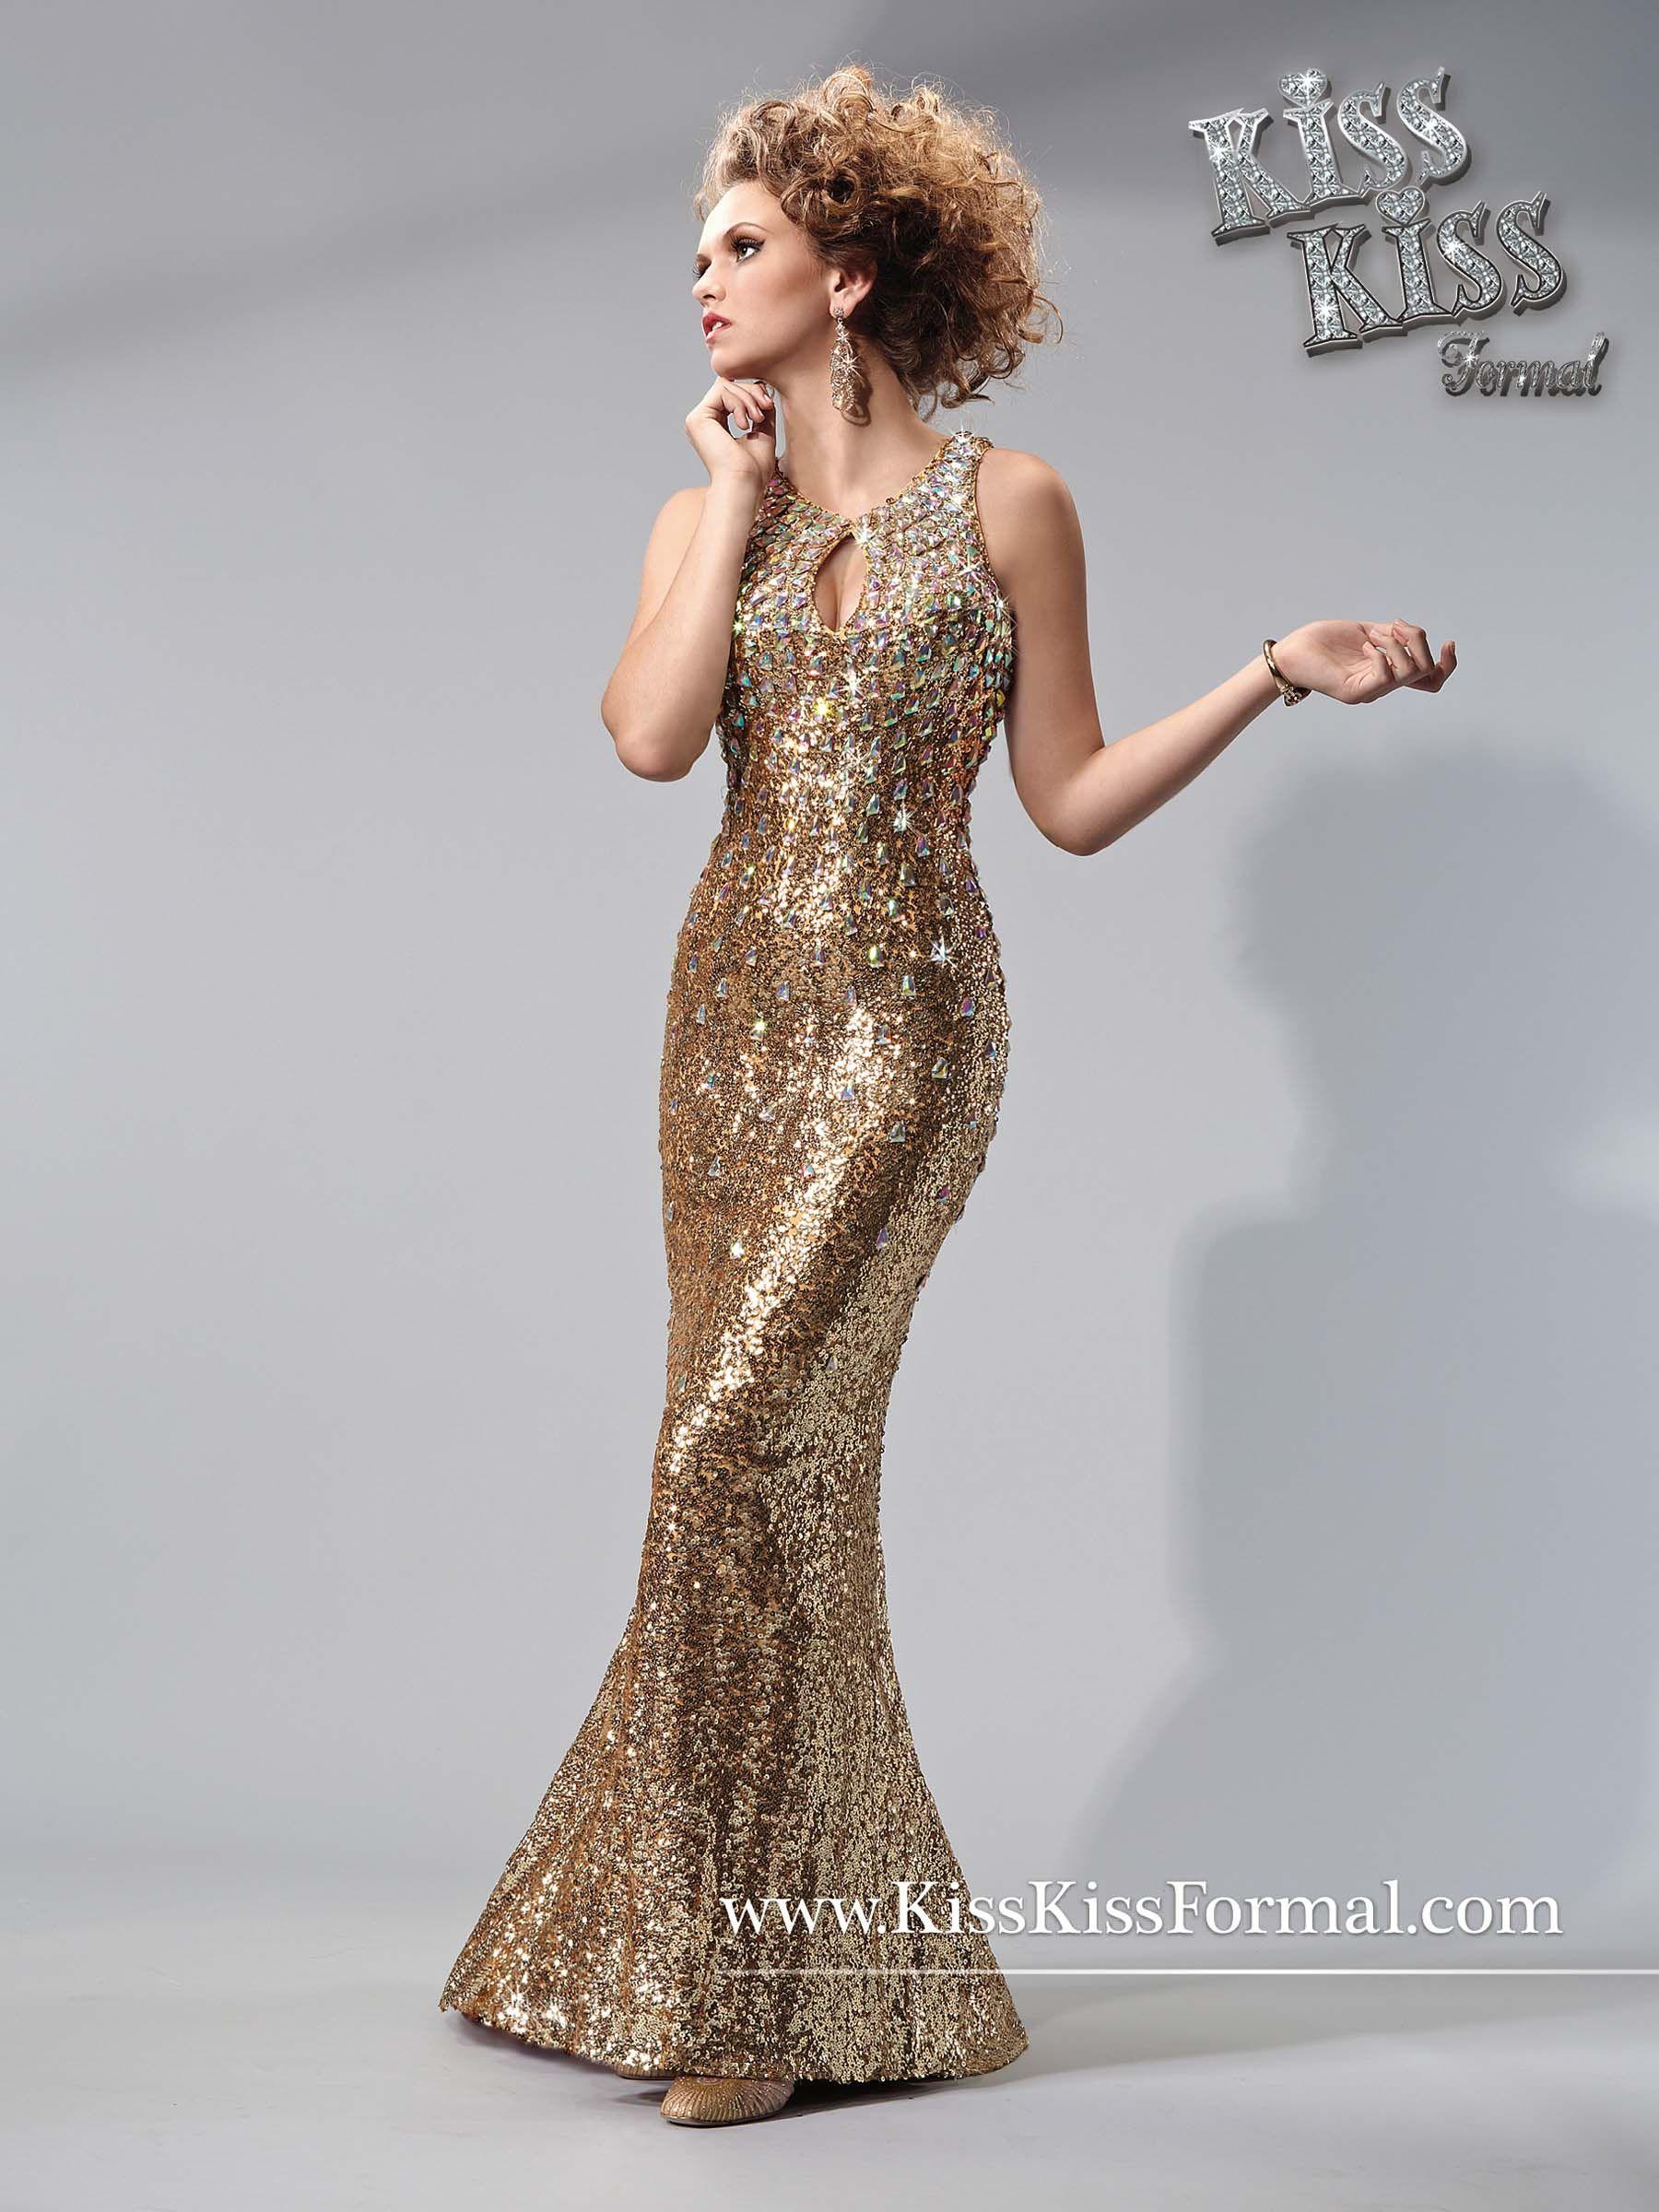 Mary\'s style ID P3713 Kiss Kiss formal wear prom dress mayras bridal ...